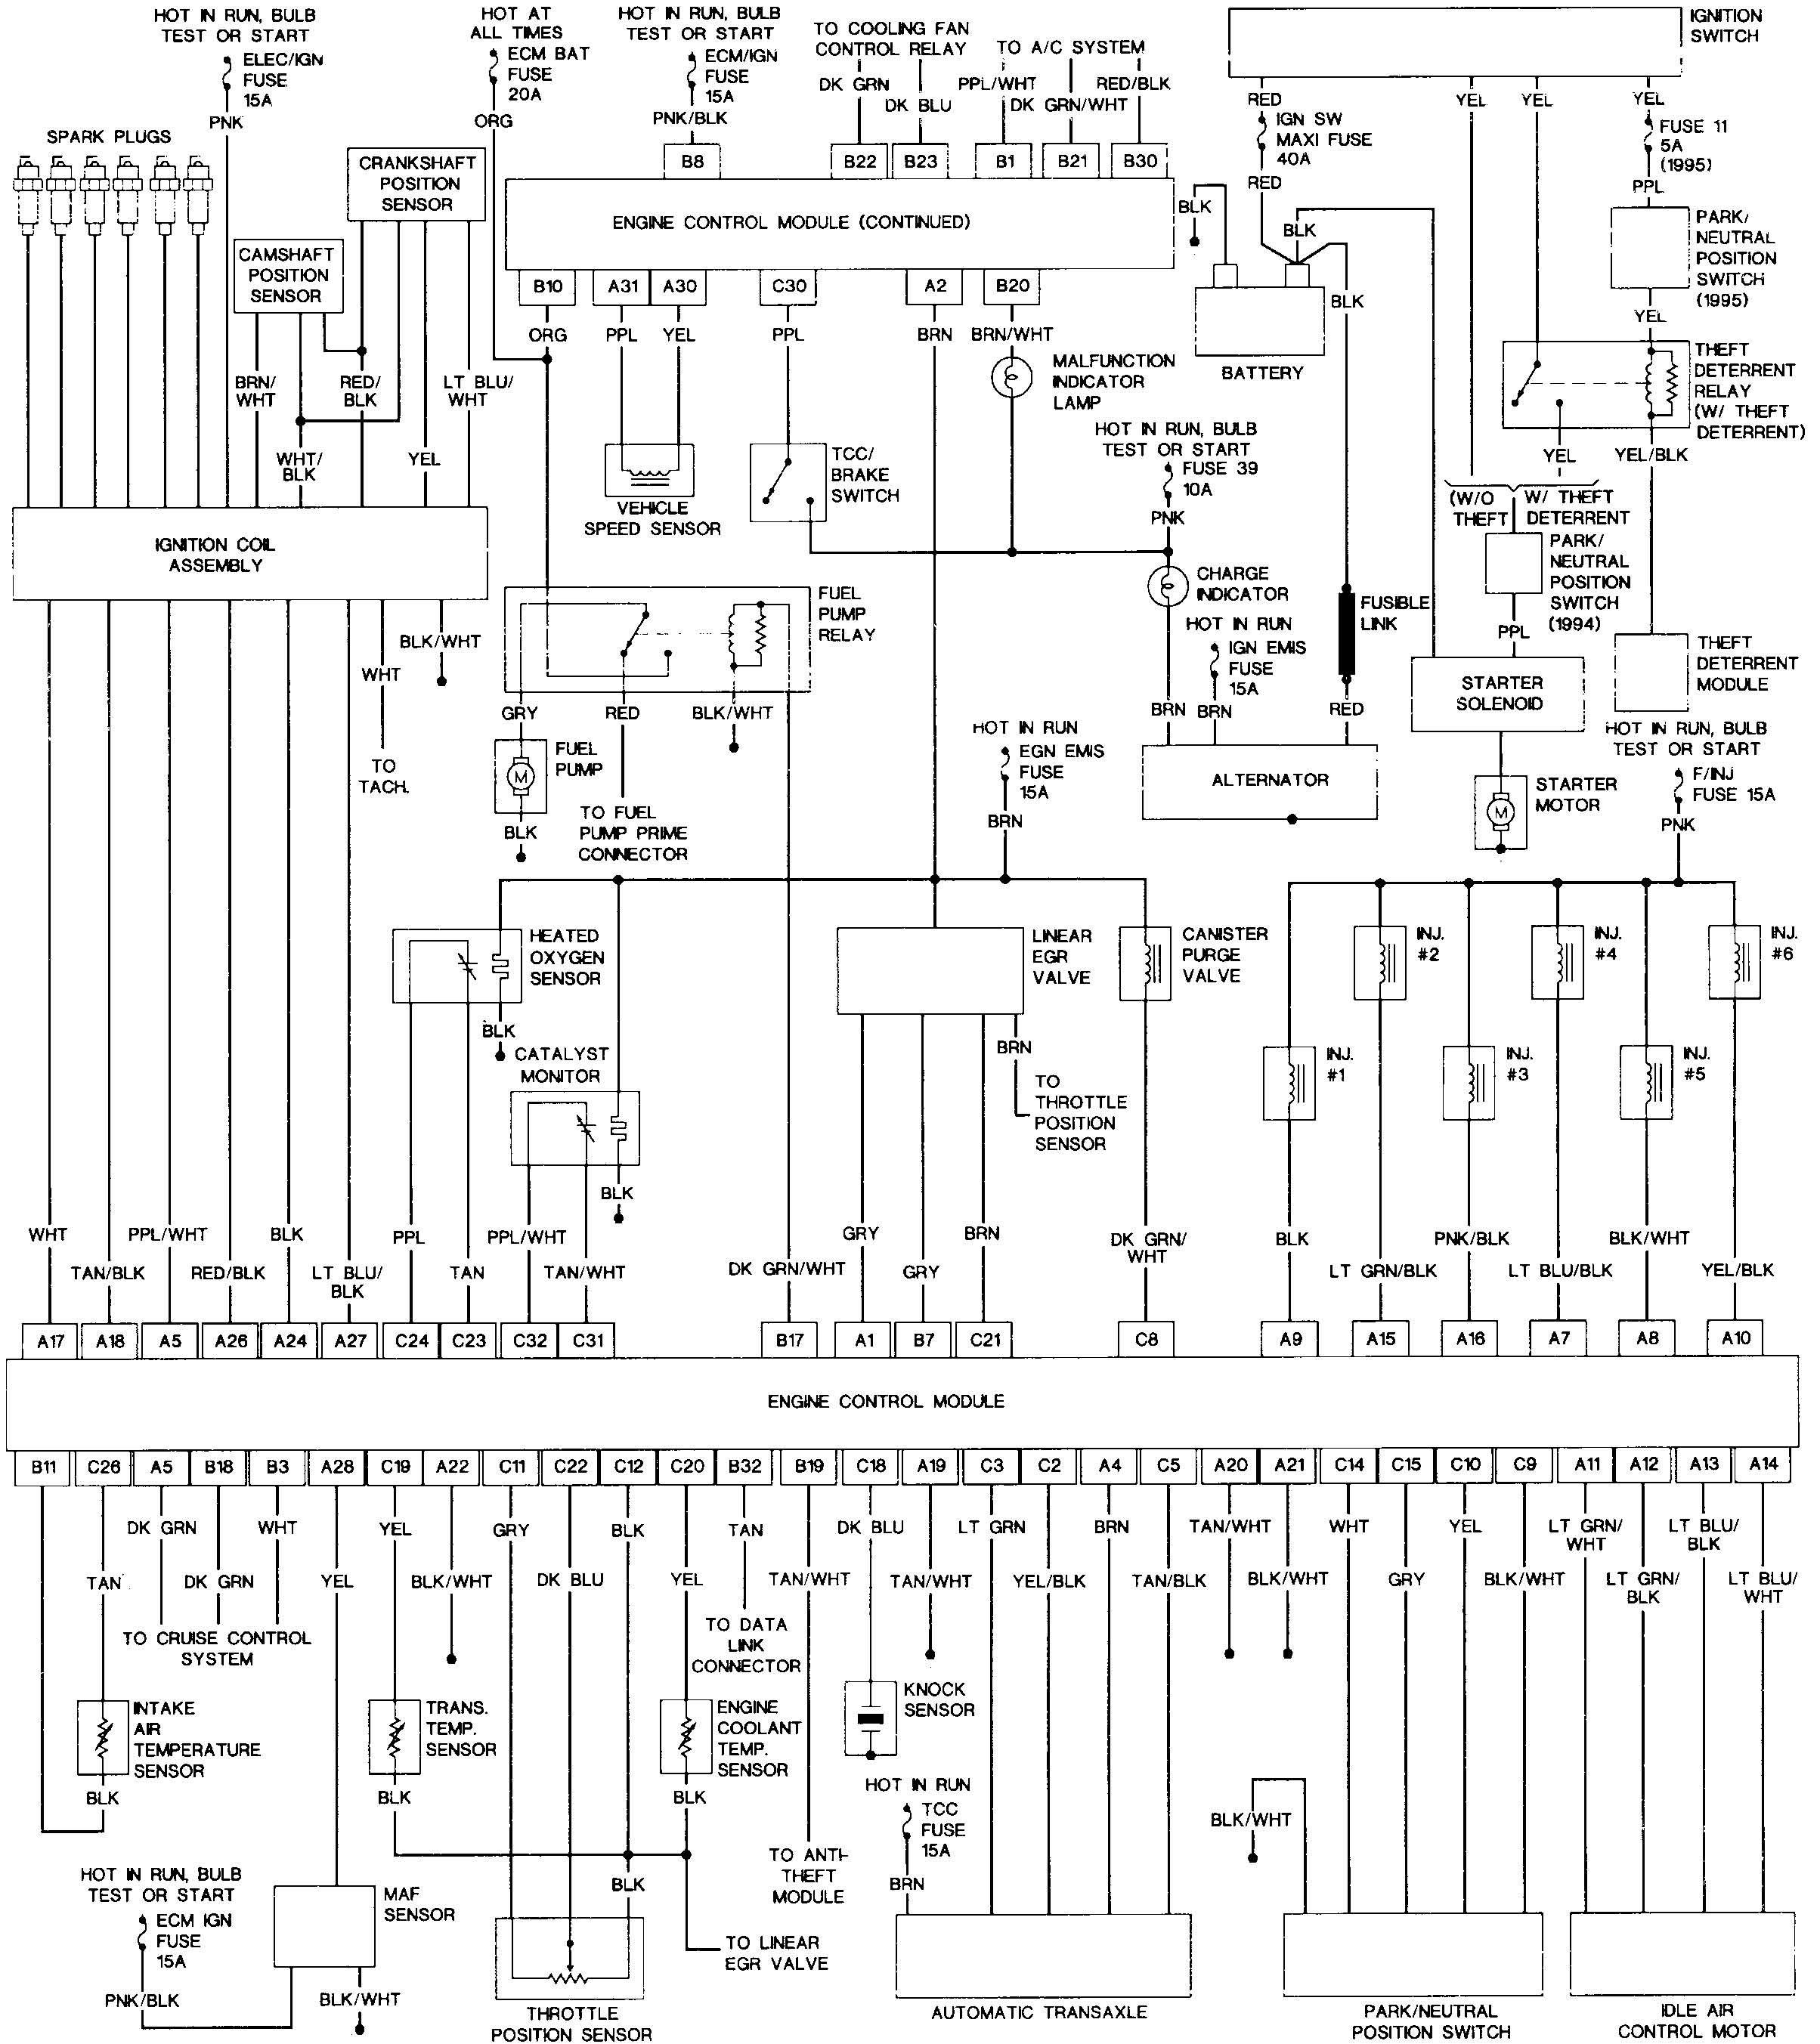 2004 Jeep Grand Cherokee Engine Diagram Kia Spectra Wiring 2000 Radio Elvenlabs Of